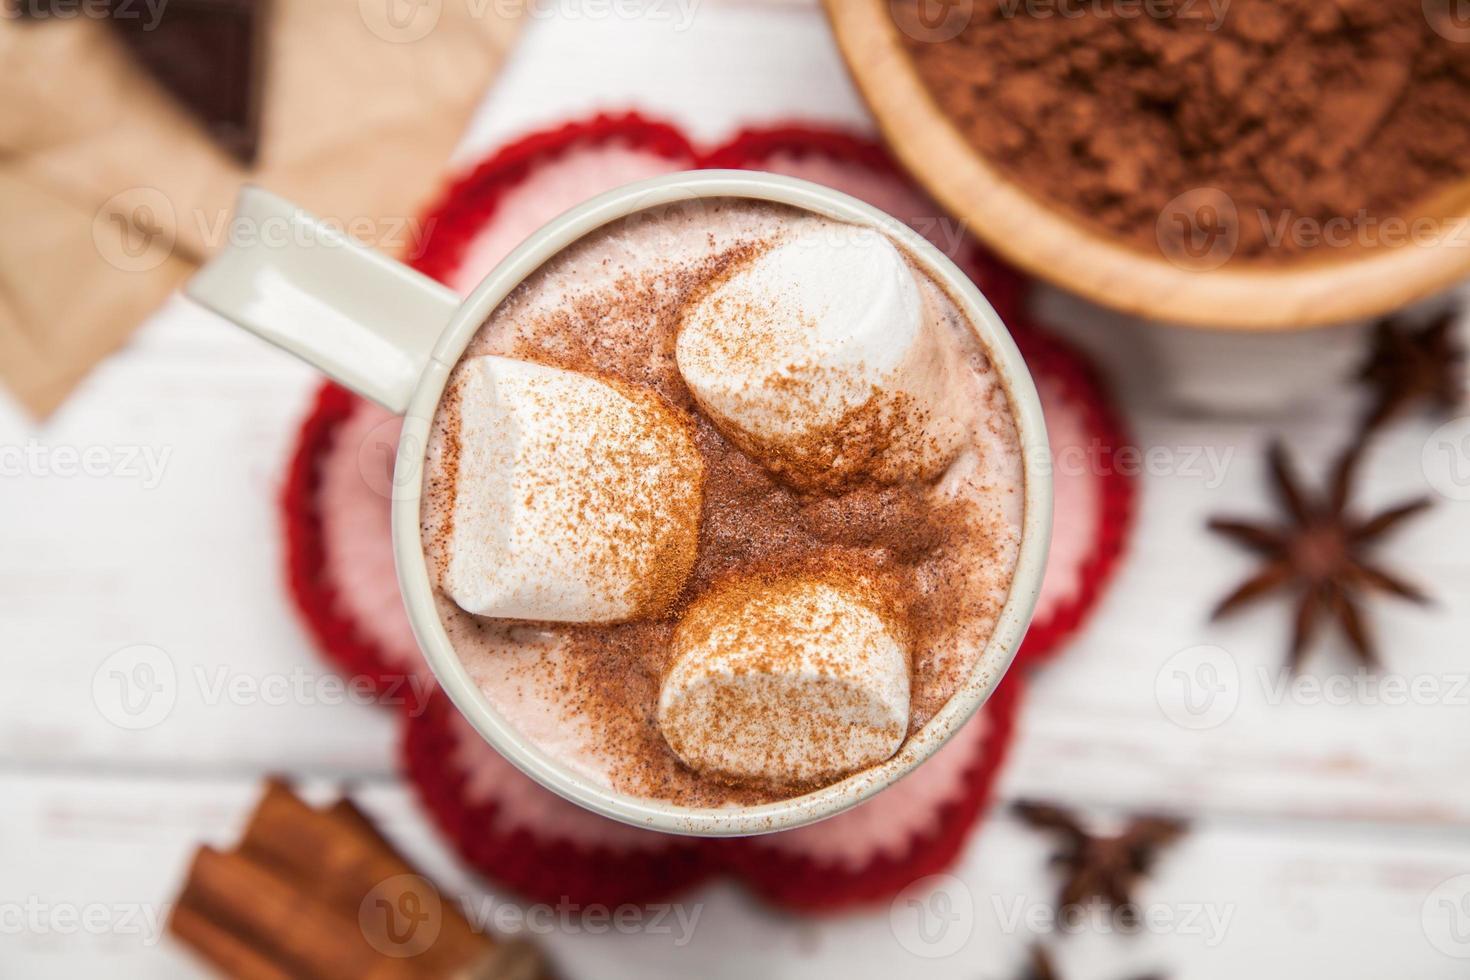 kakaodrink med marshmallows foto